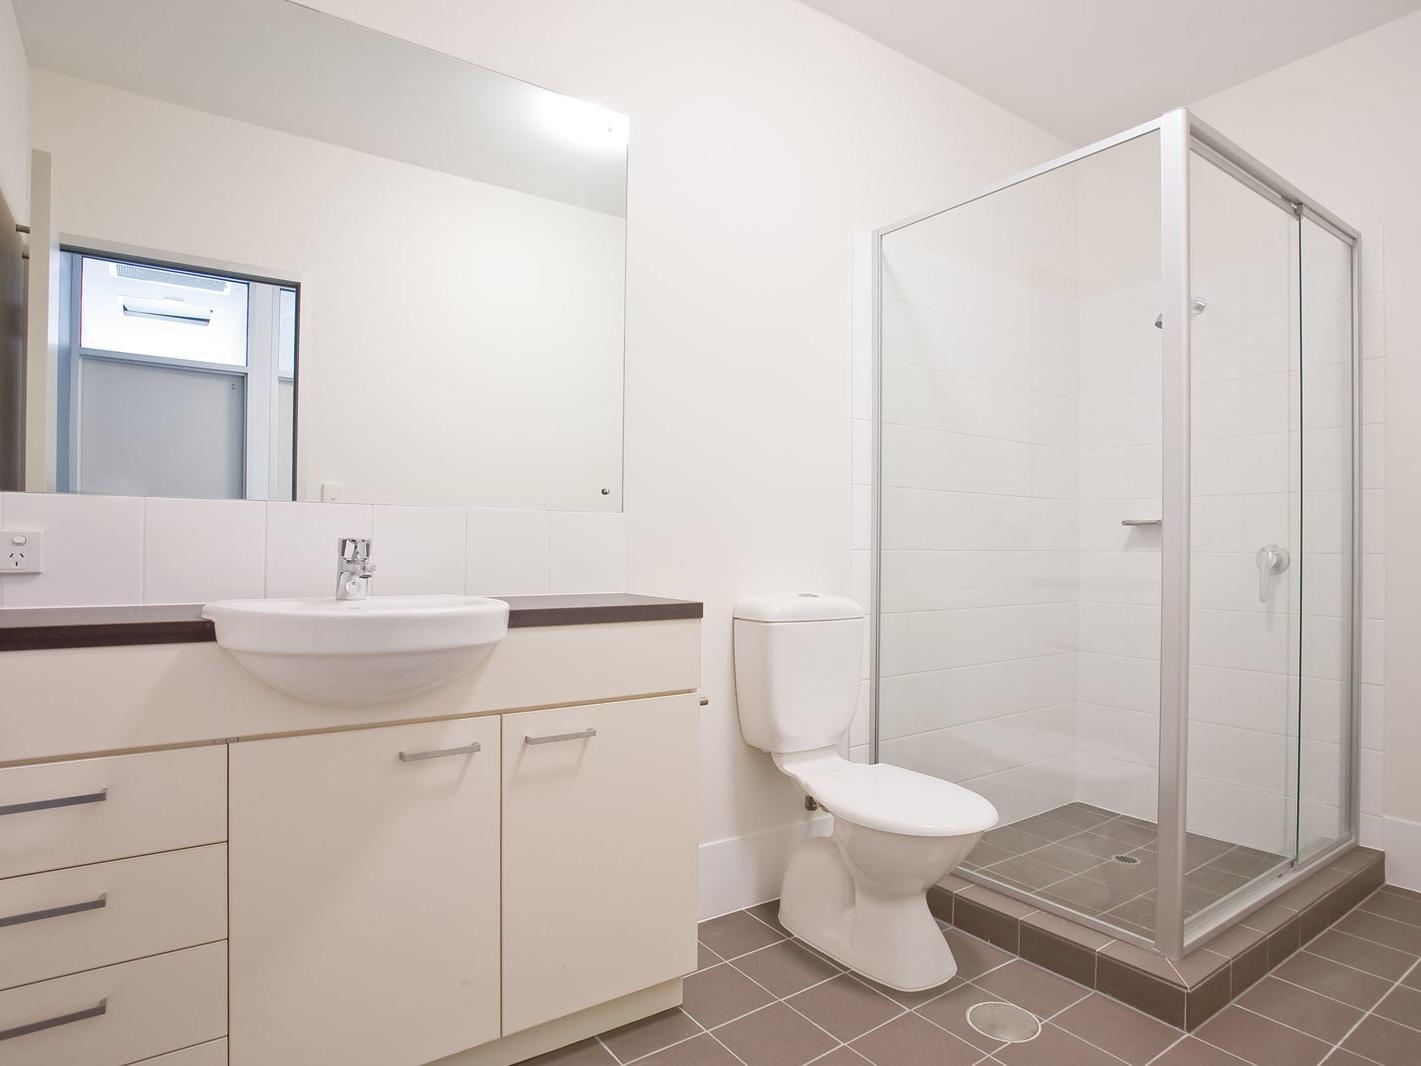 Penthouse Loft Bathroom